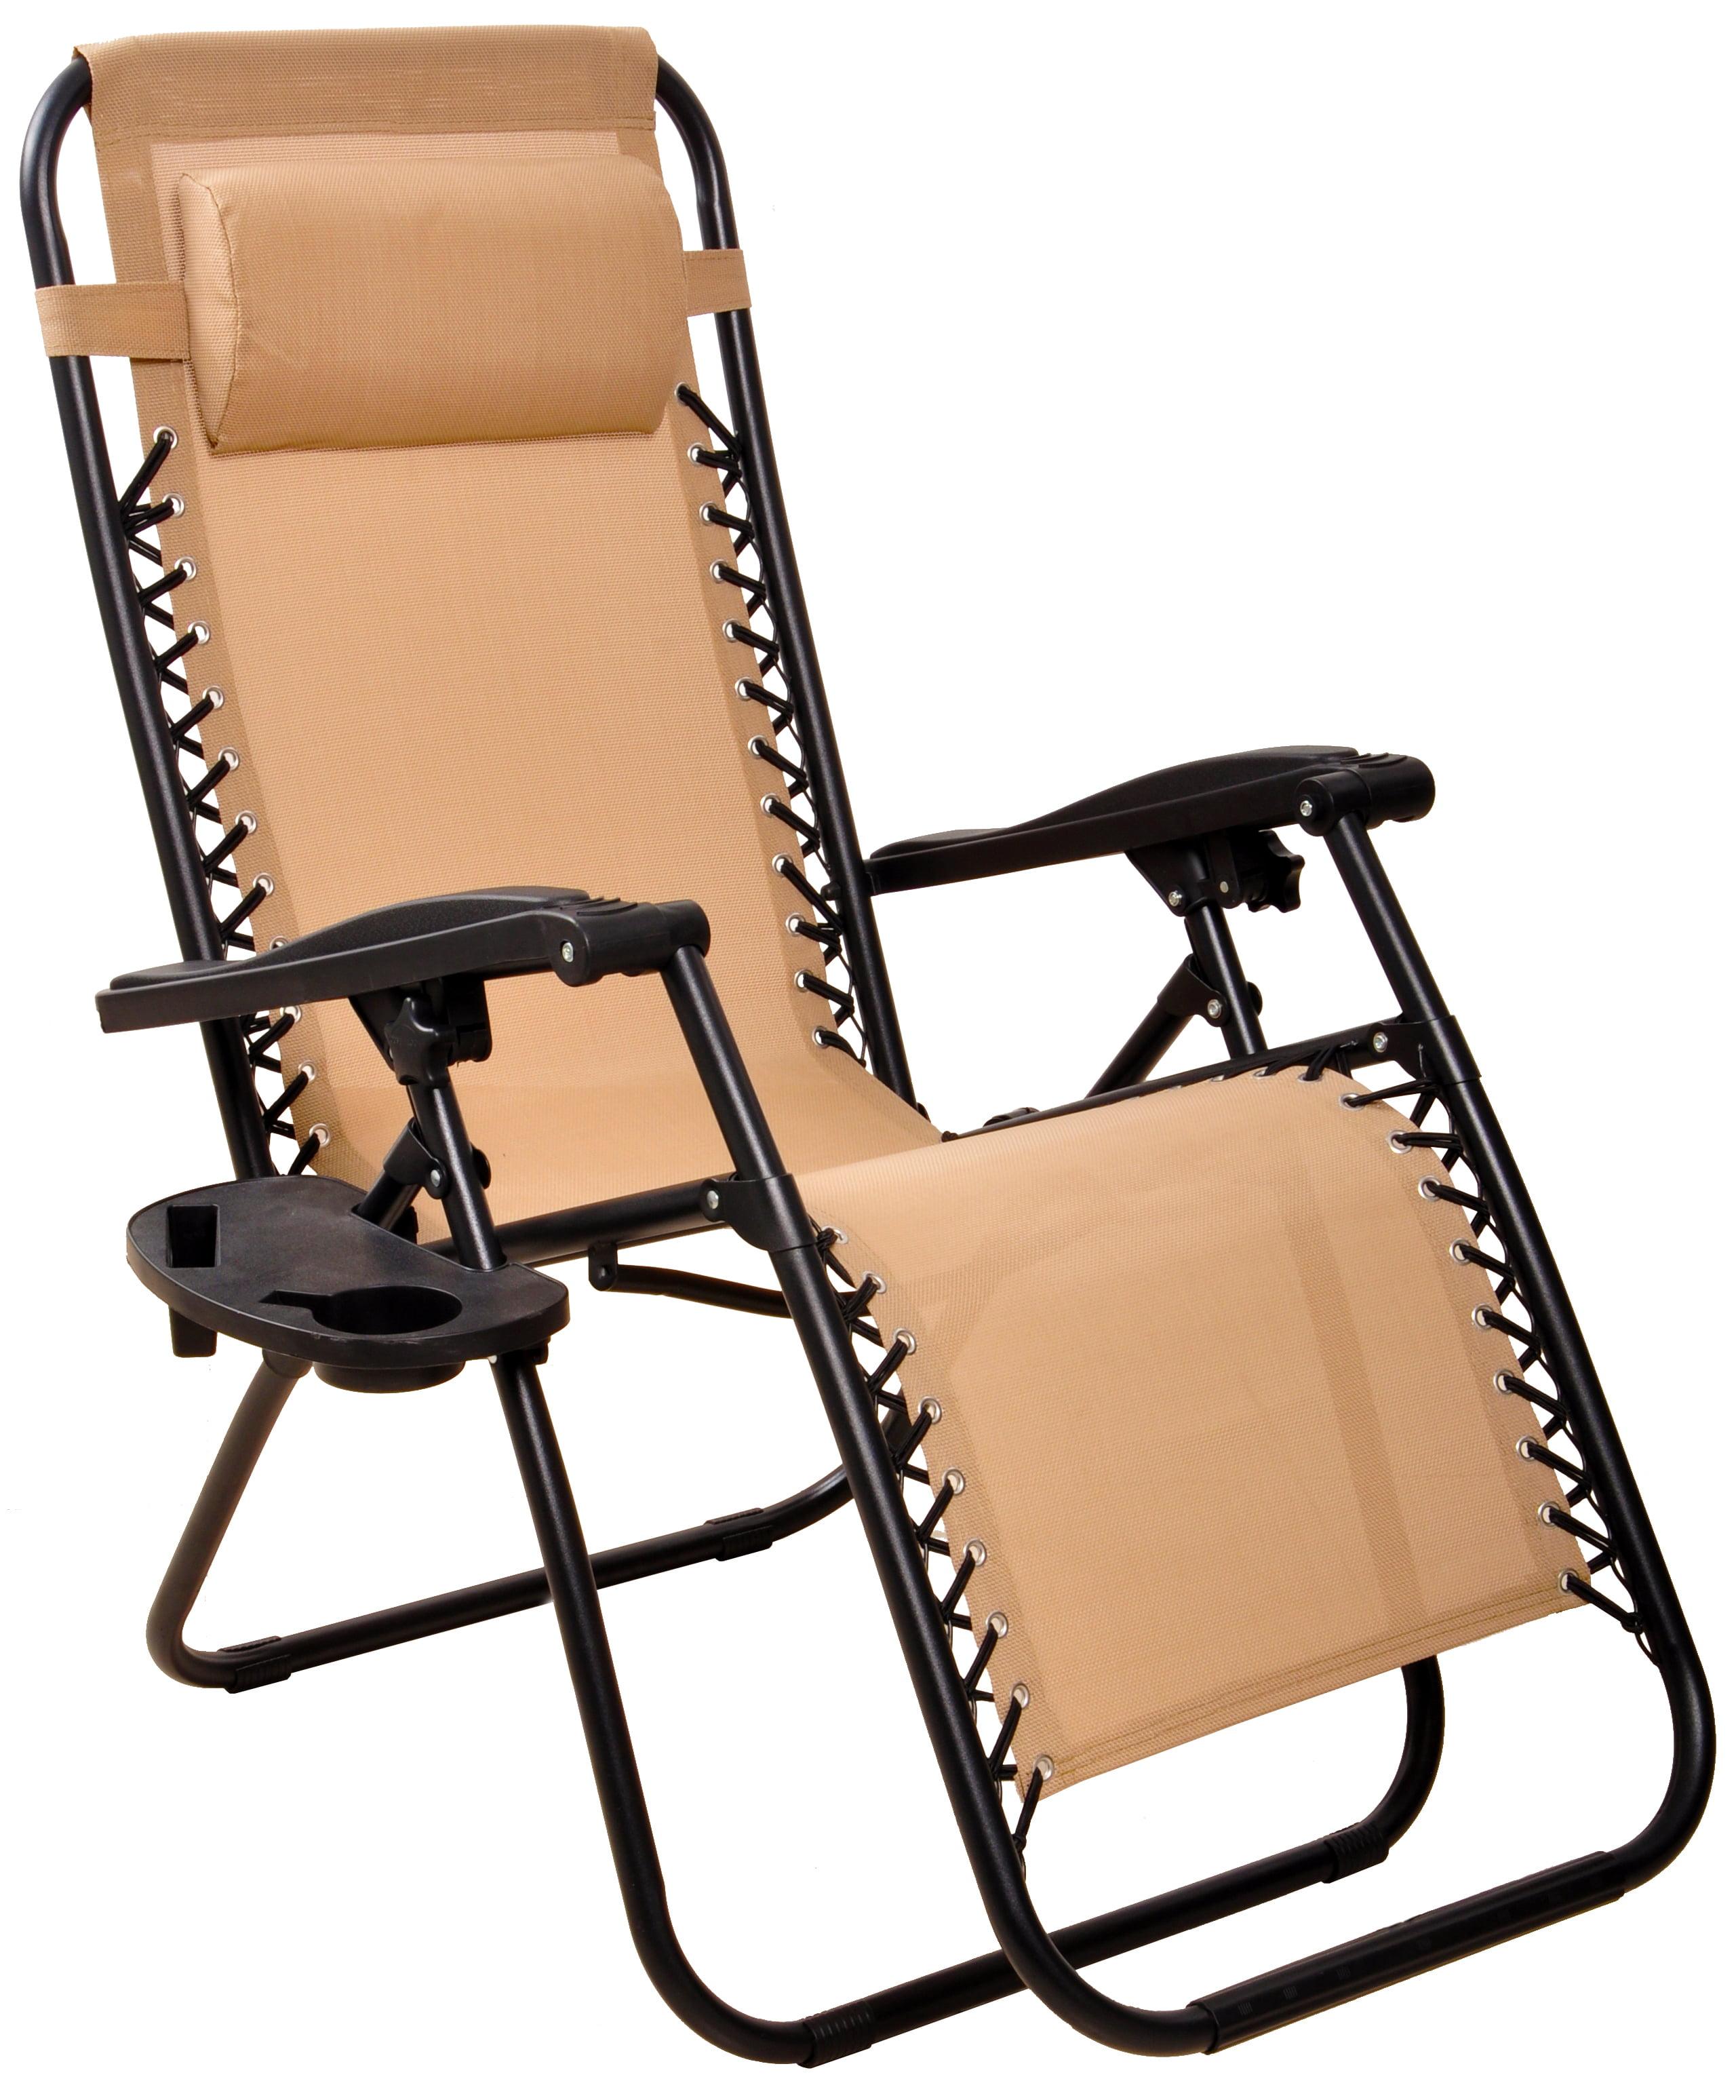 Set of 2 Loungers - Cream Blush Marko Outdoor Reclining Sun Lounger Zero Gravity Folding Chair Bed Seat Patio Garden Poolside Recliner